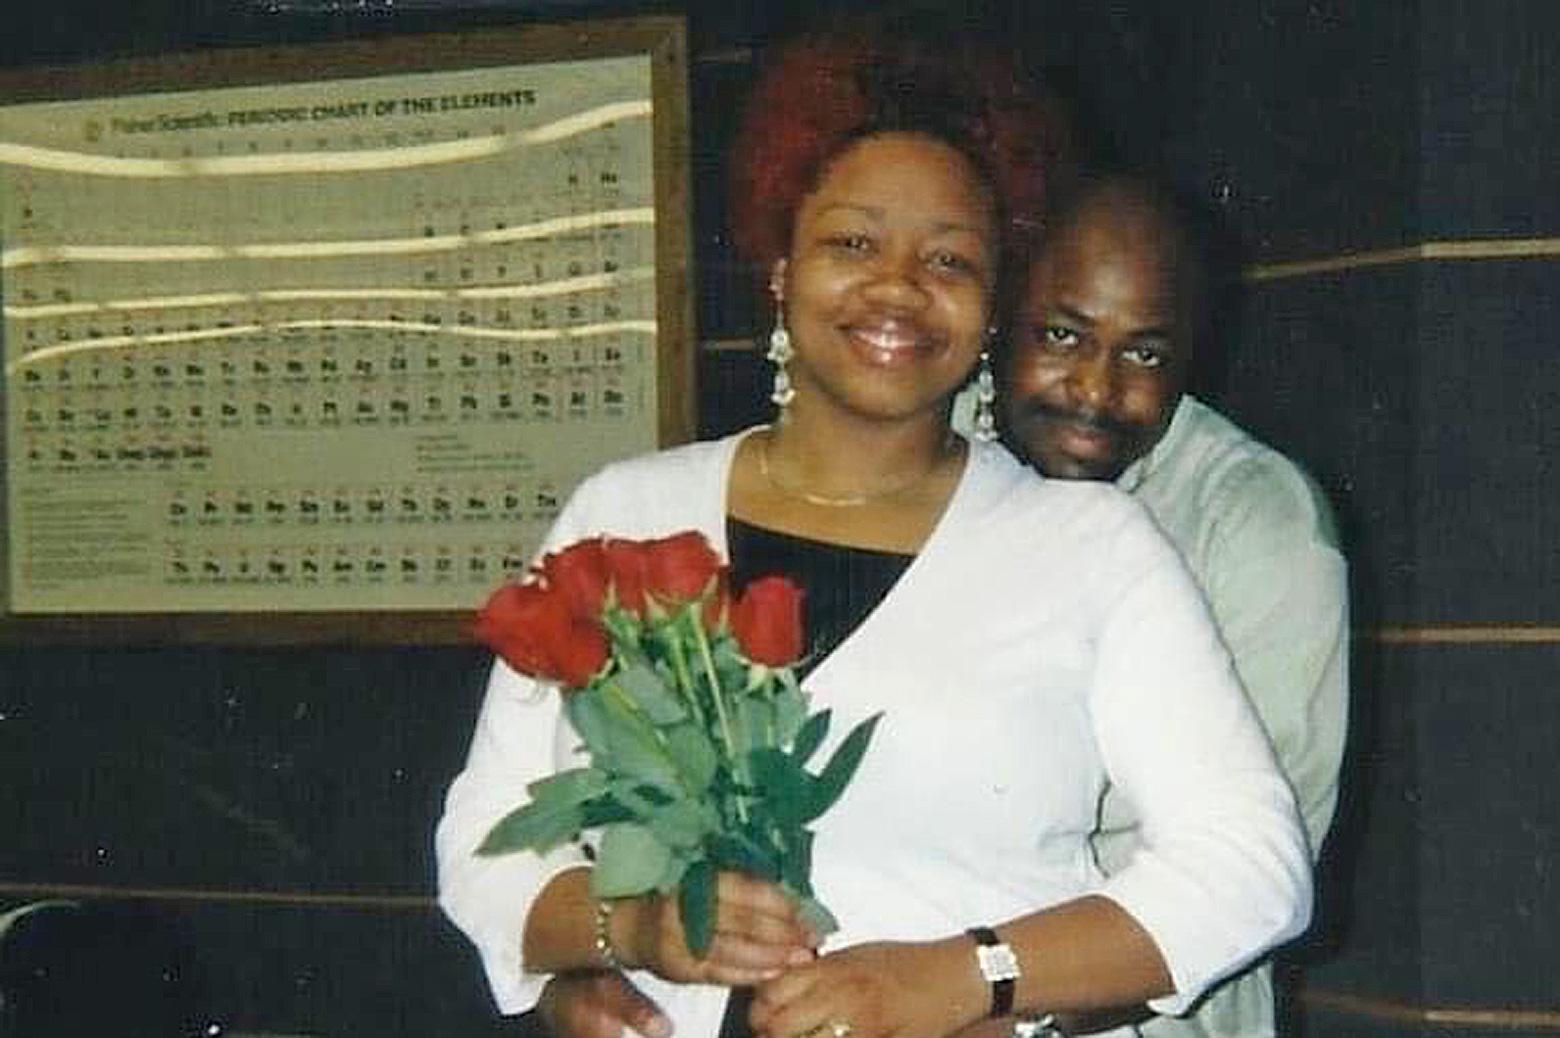 Leroy and Janicca Covington